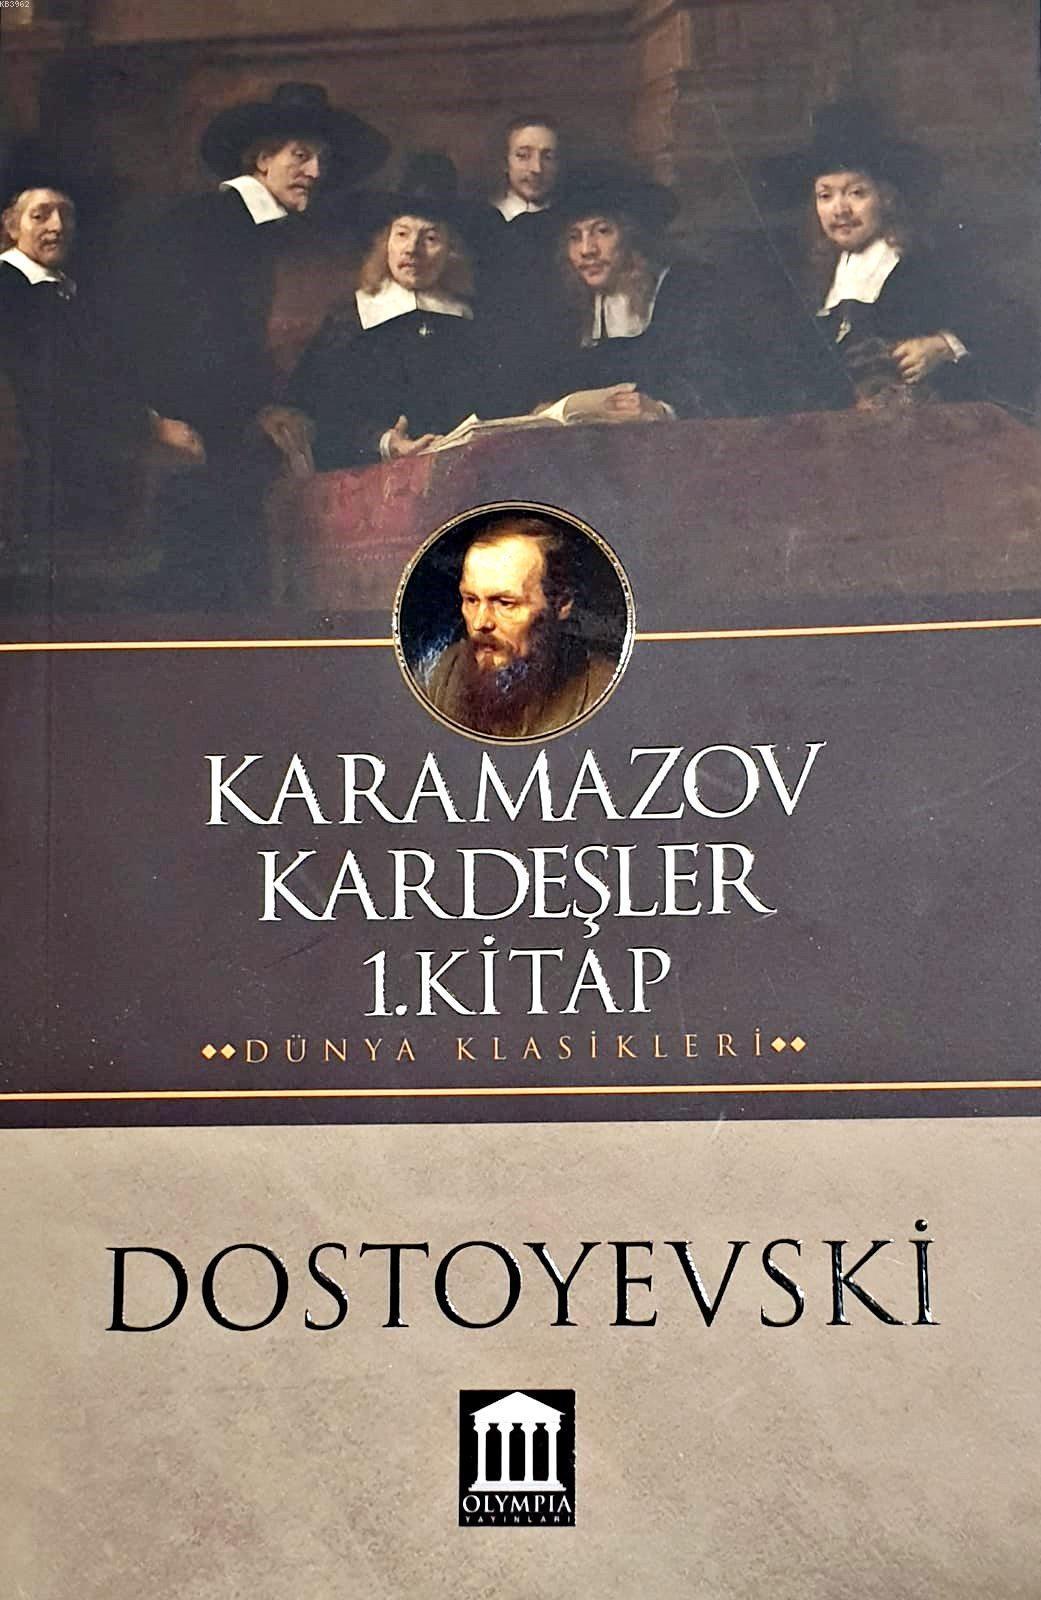 Karamazov Kardeşler 1. Kitap